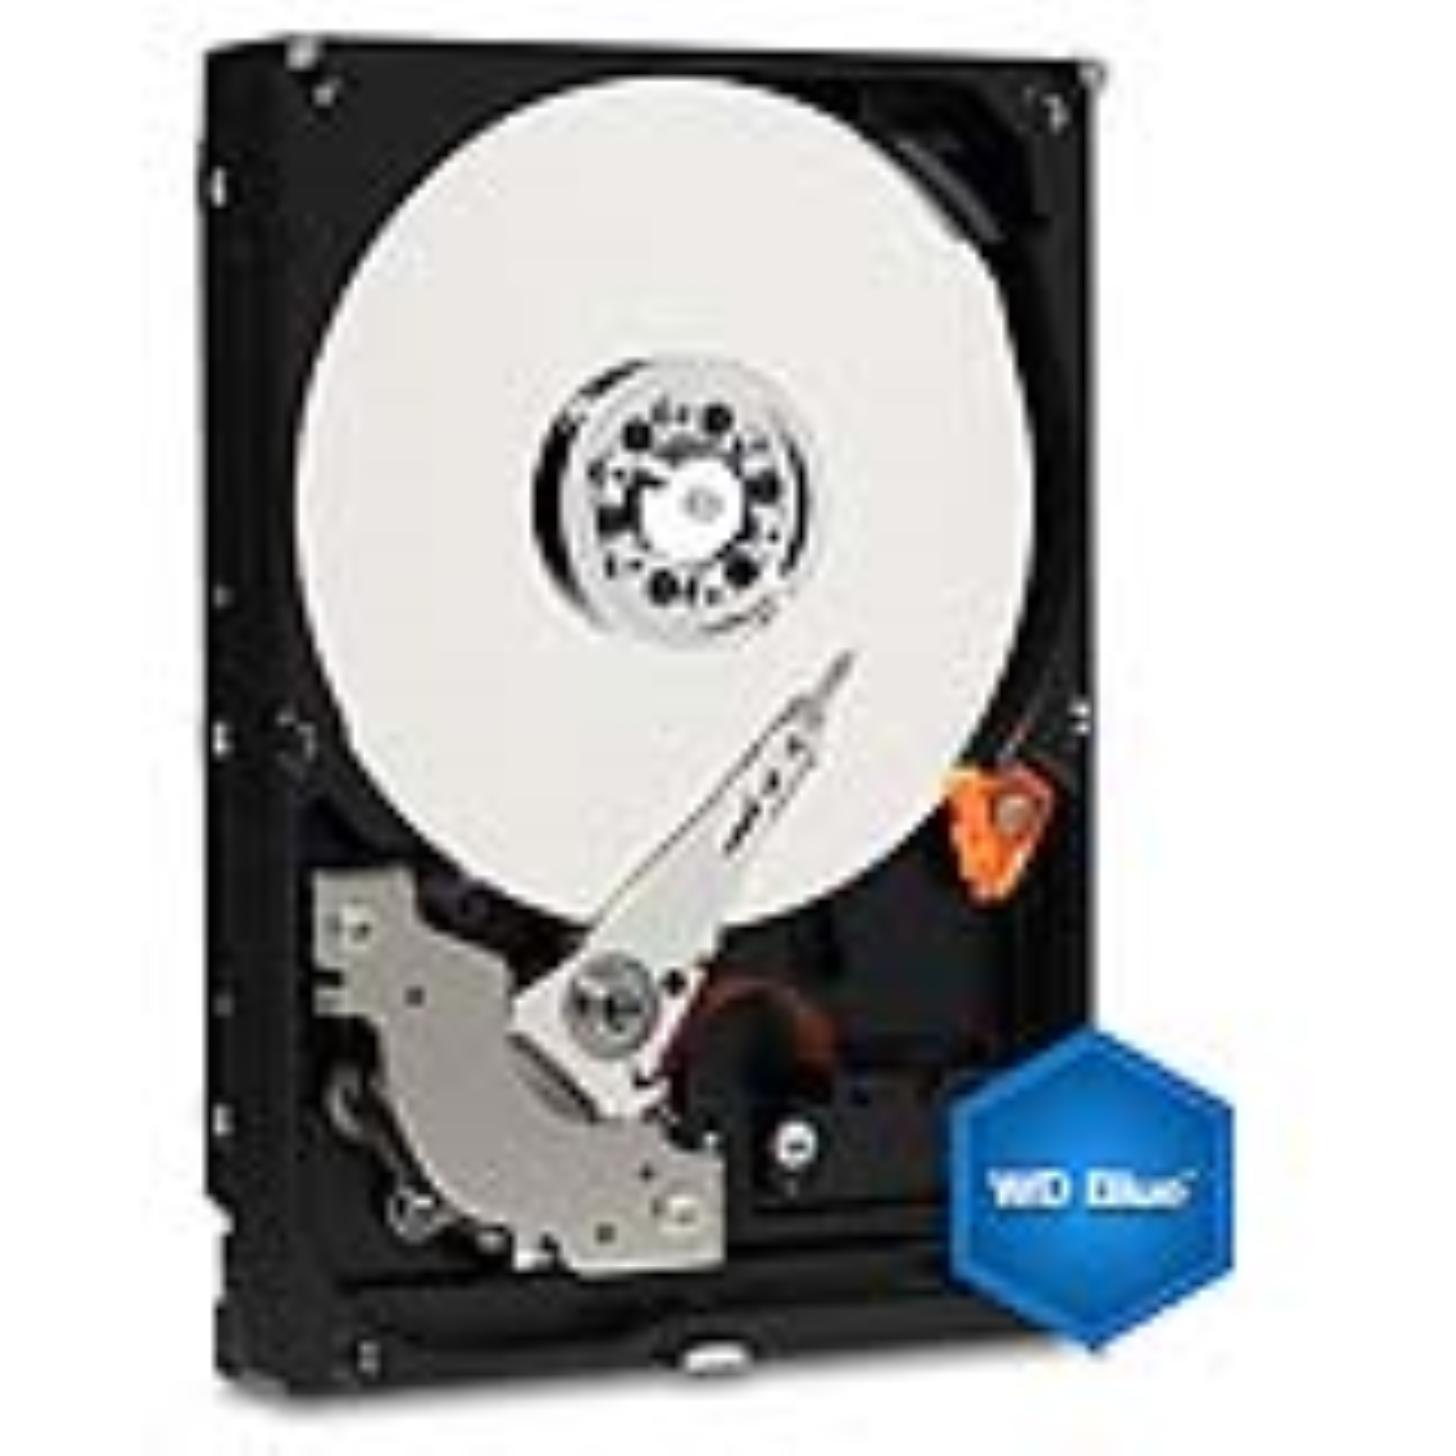 WD BLUE WD5000AZLX 500GB SATA/600 32MB cache 7200 ot.